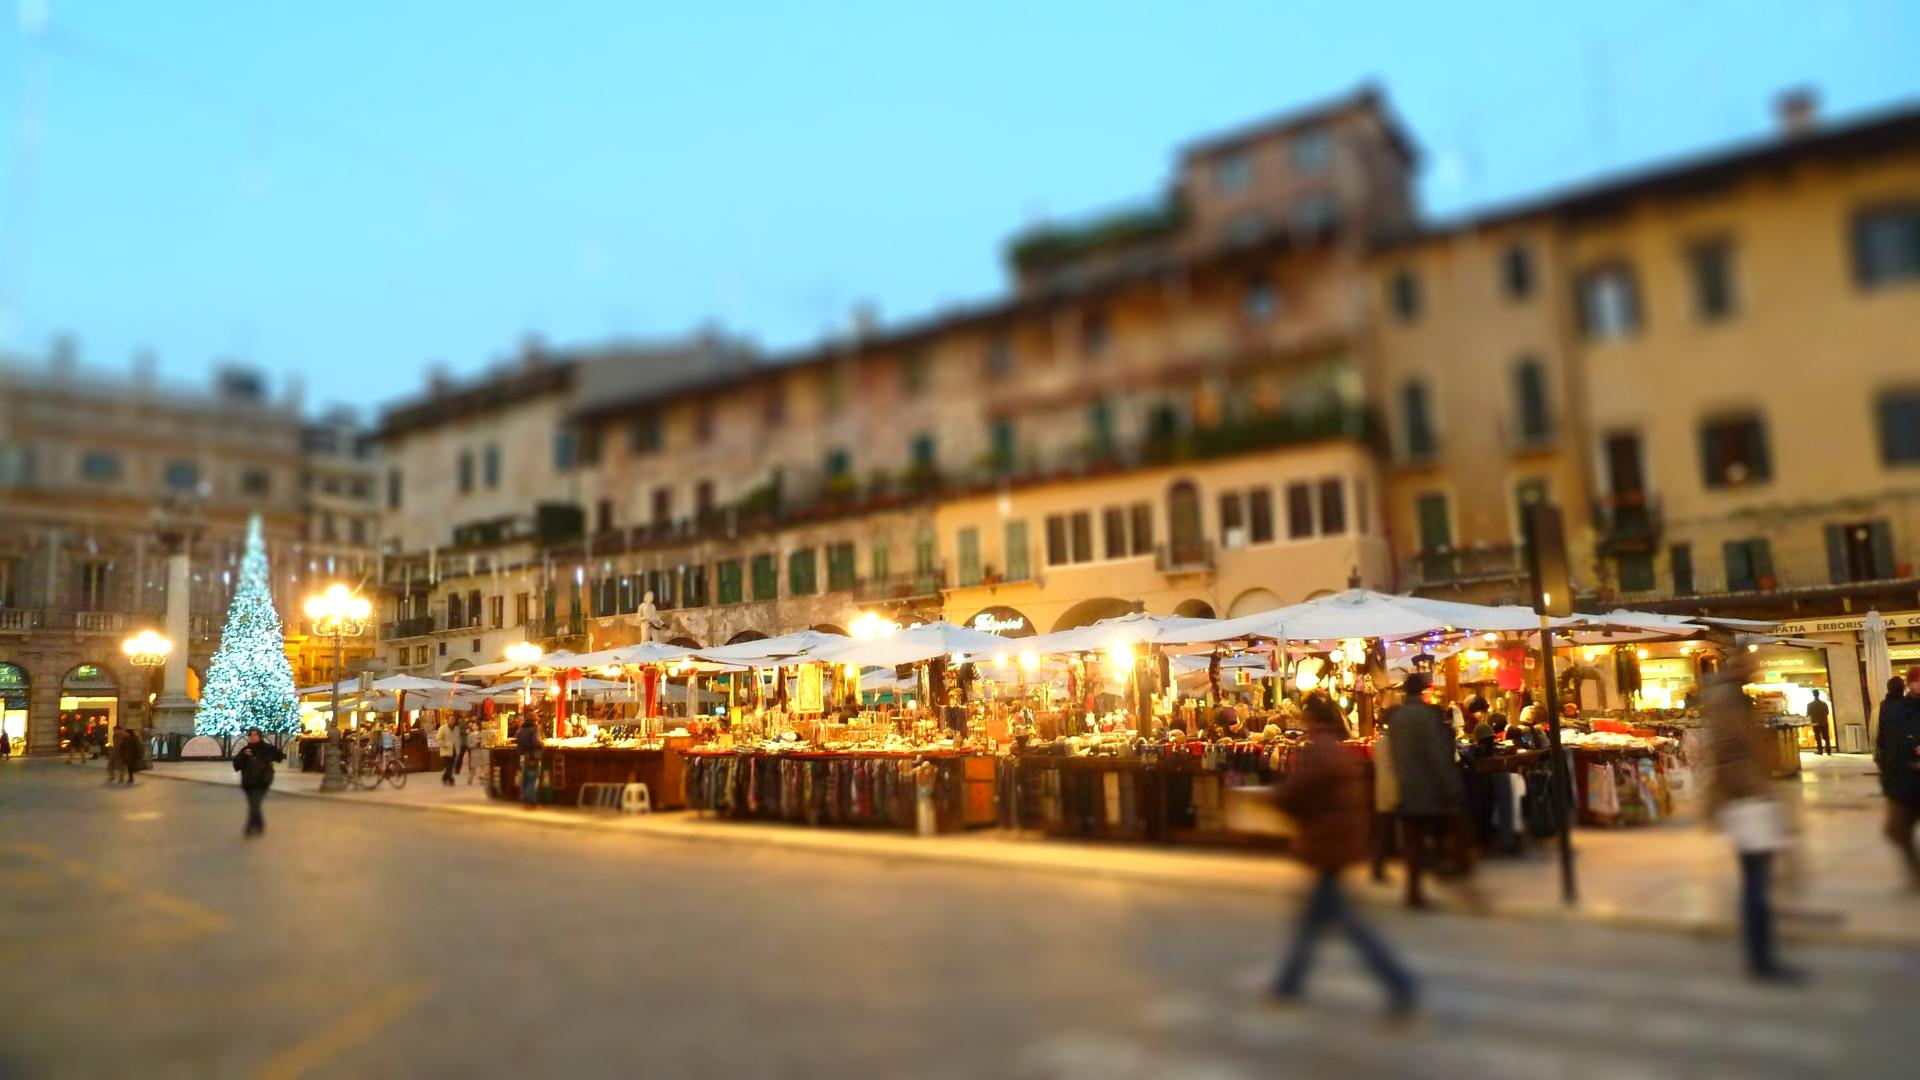 Mercado verona